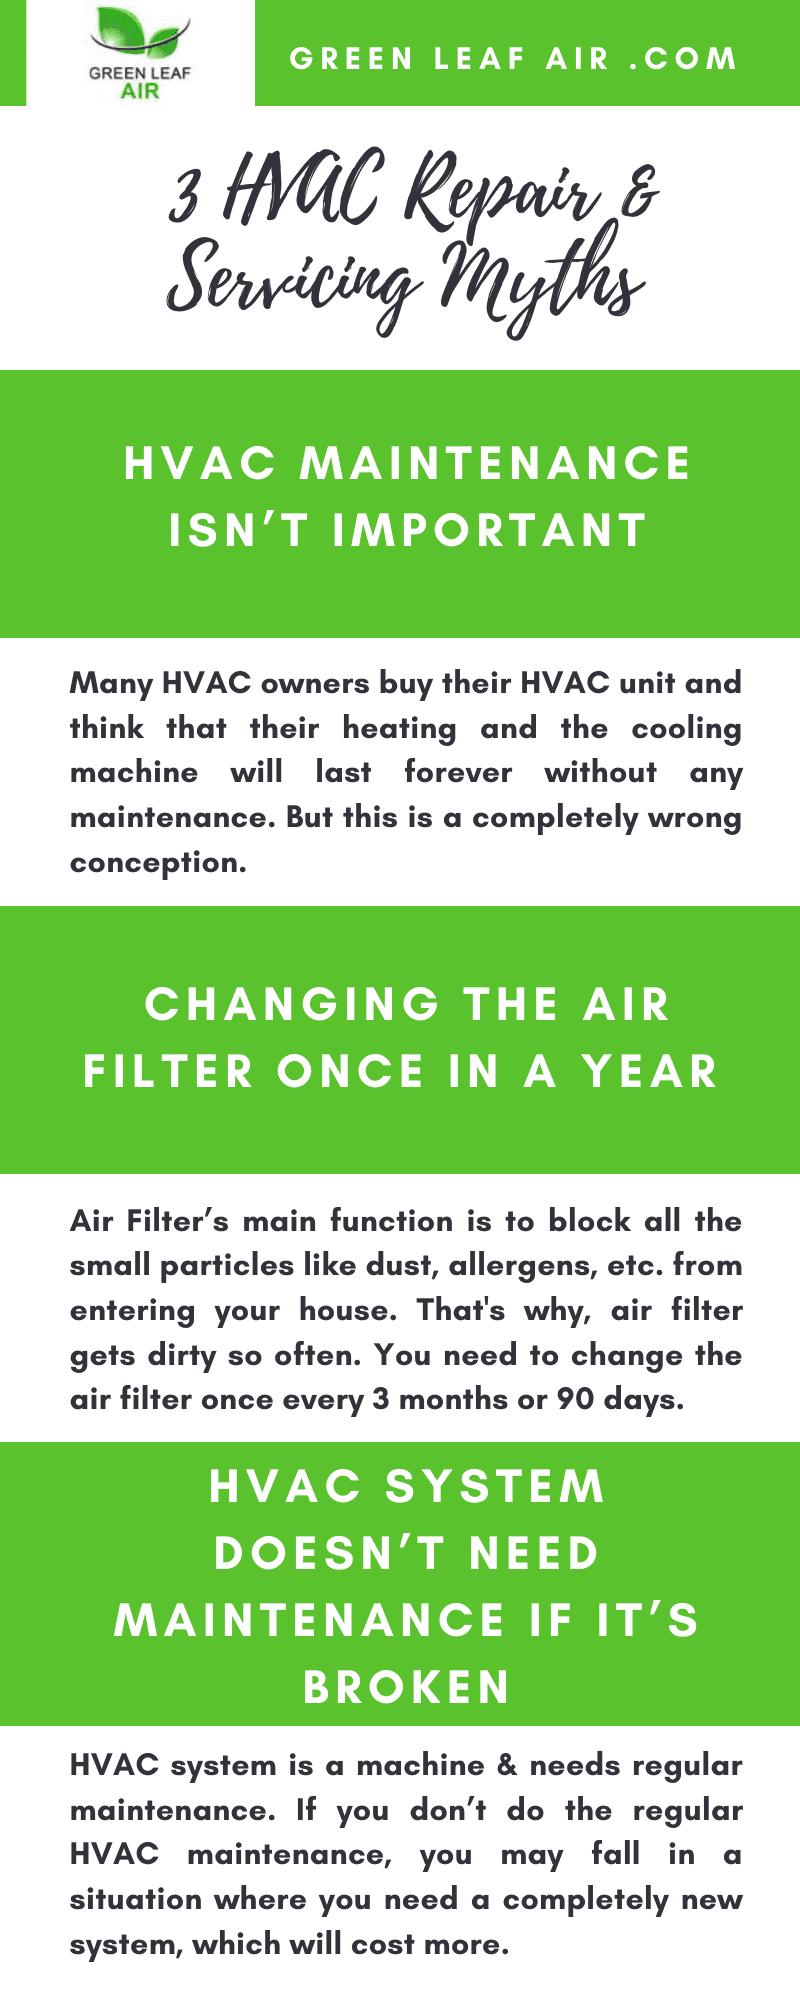 3 HVAC Repair & Servicing Myths